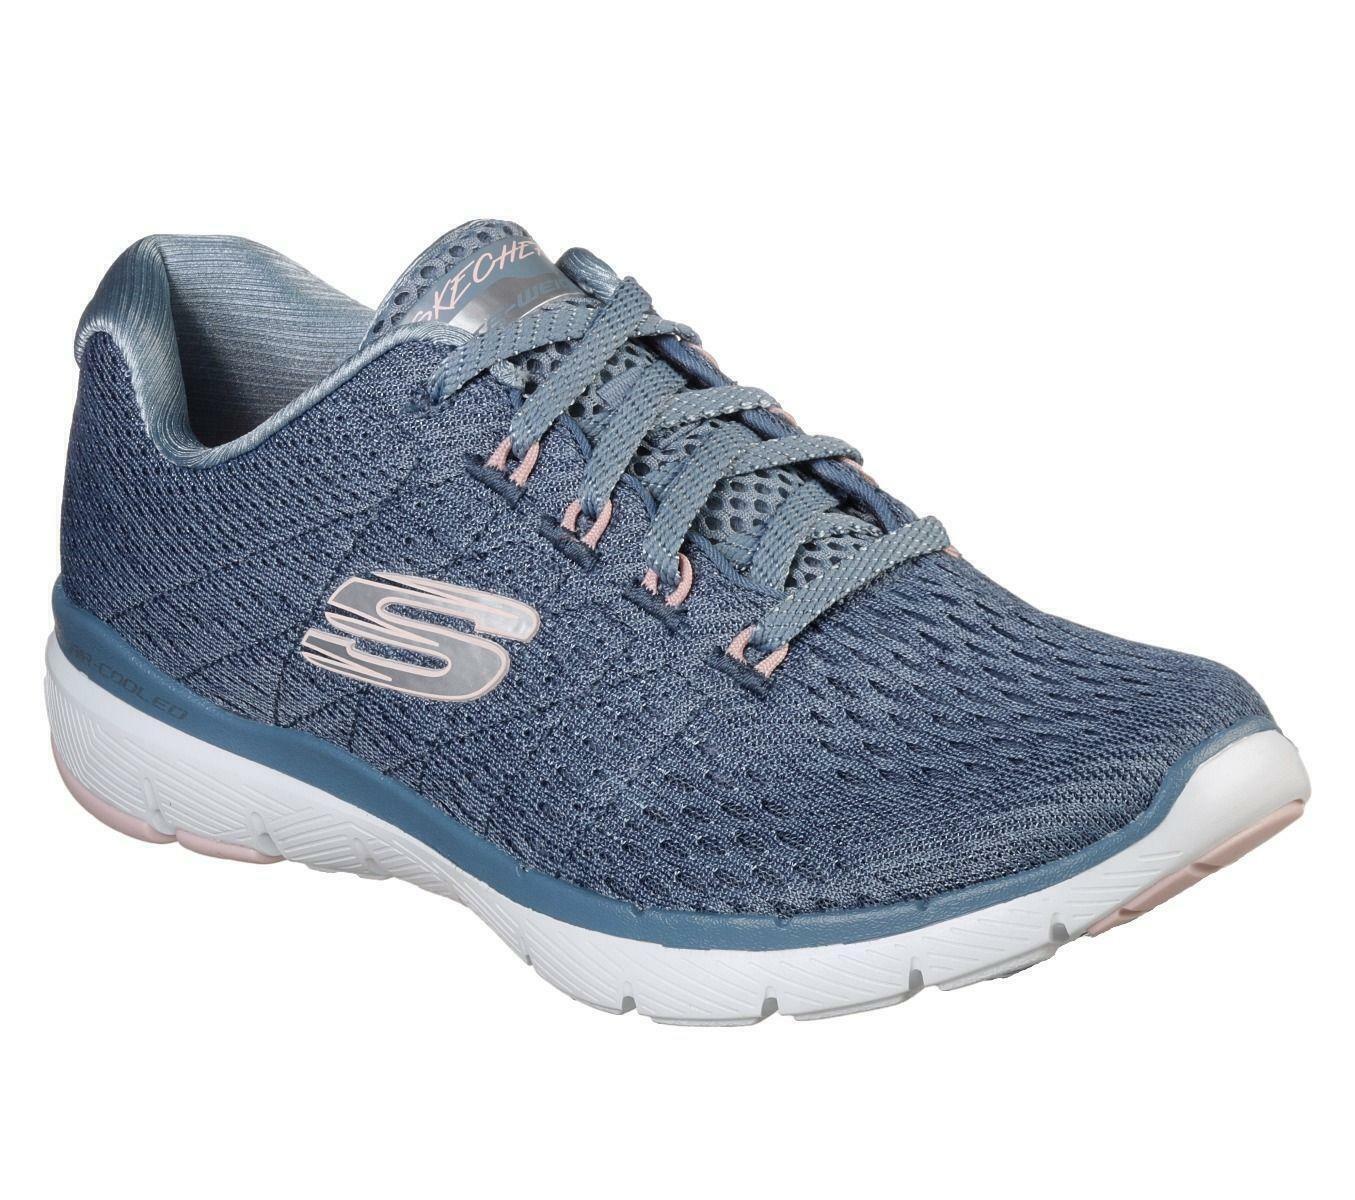 Skechers Memory Foam Shoes Womens Online Shopping For Women Men